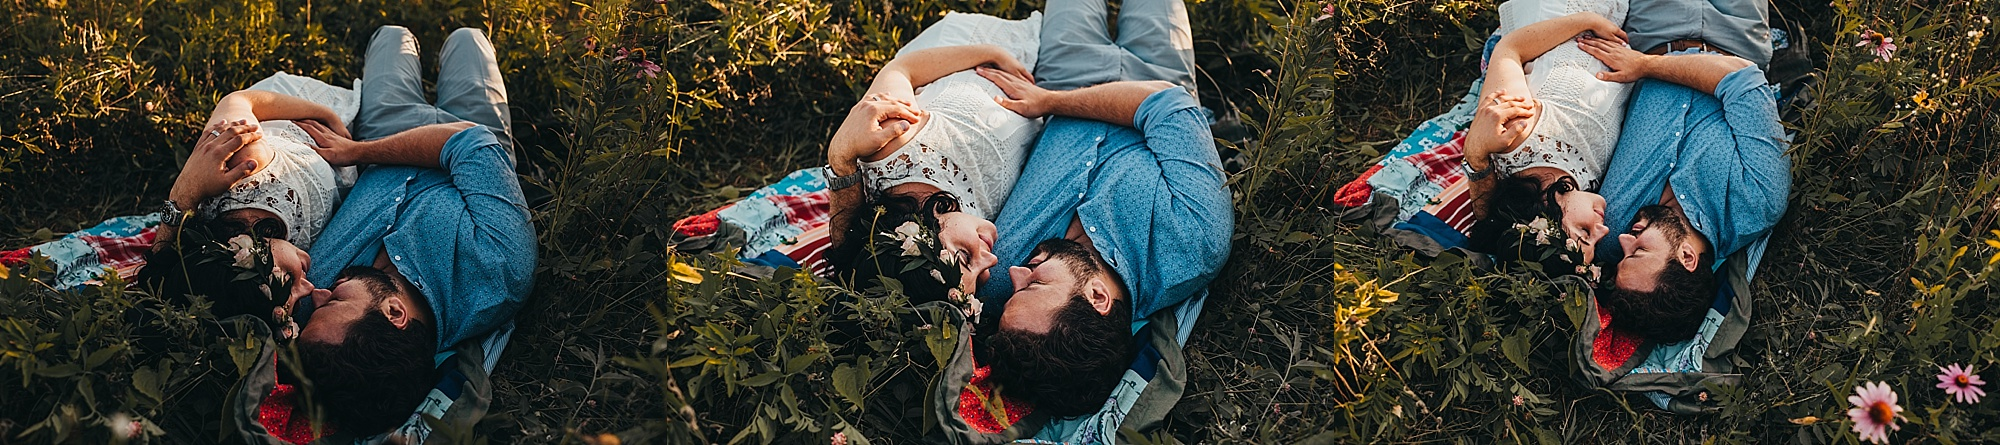 lauren-grayson-photography-cleveland-ohio-photographer-maternity-summer-outdoor-bohemian-fields-session_0492.jpg